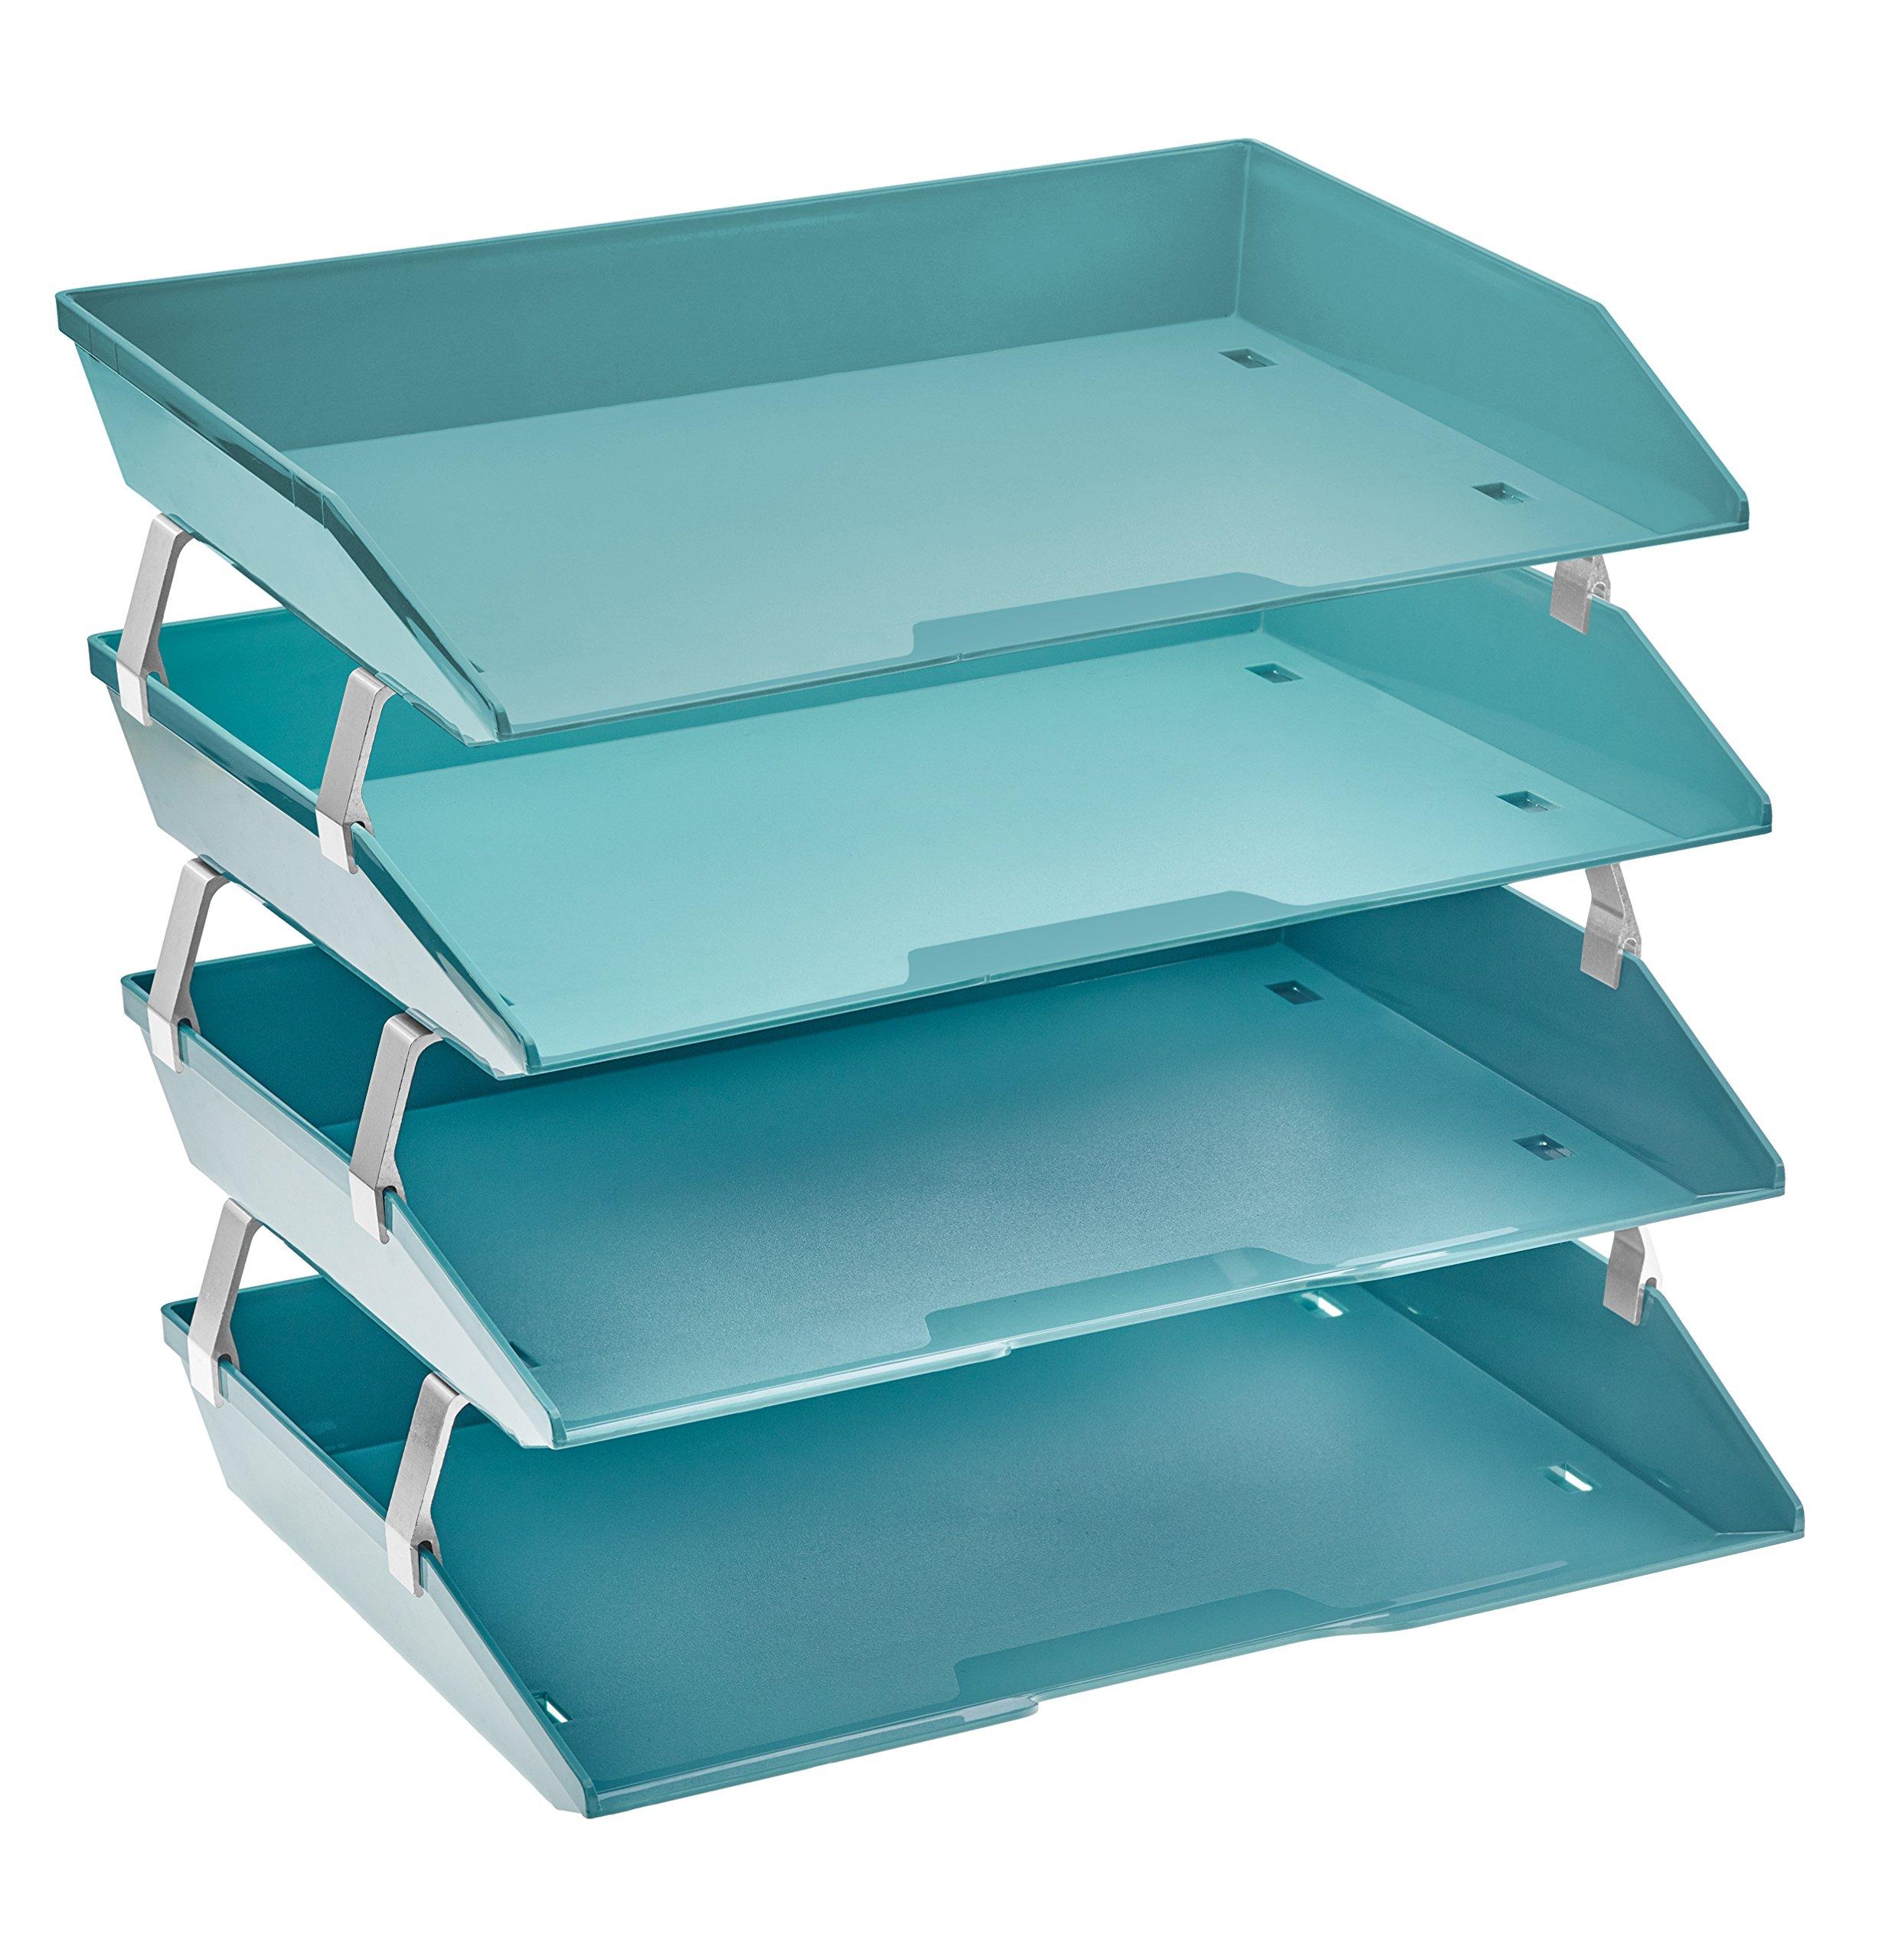 Acrimet Facility 4 Tier Letter Tray Side Load Plastic Desktop File Organizer (Solid Green Color) by Acrimet